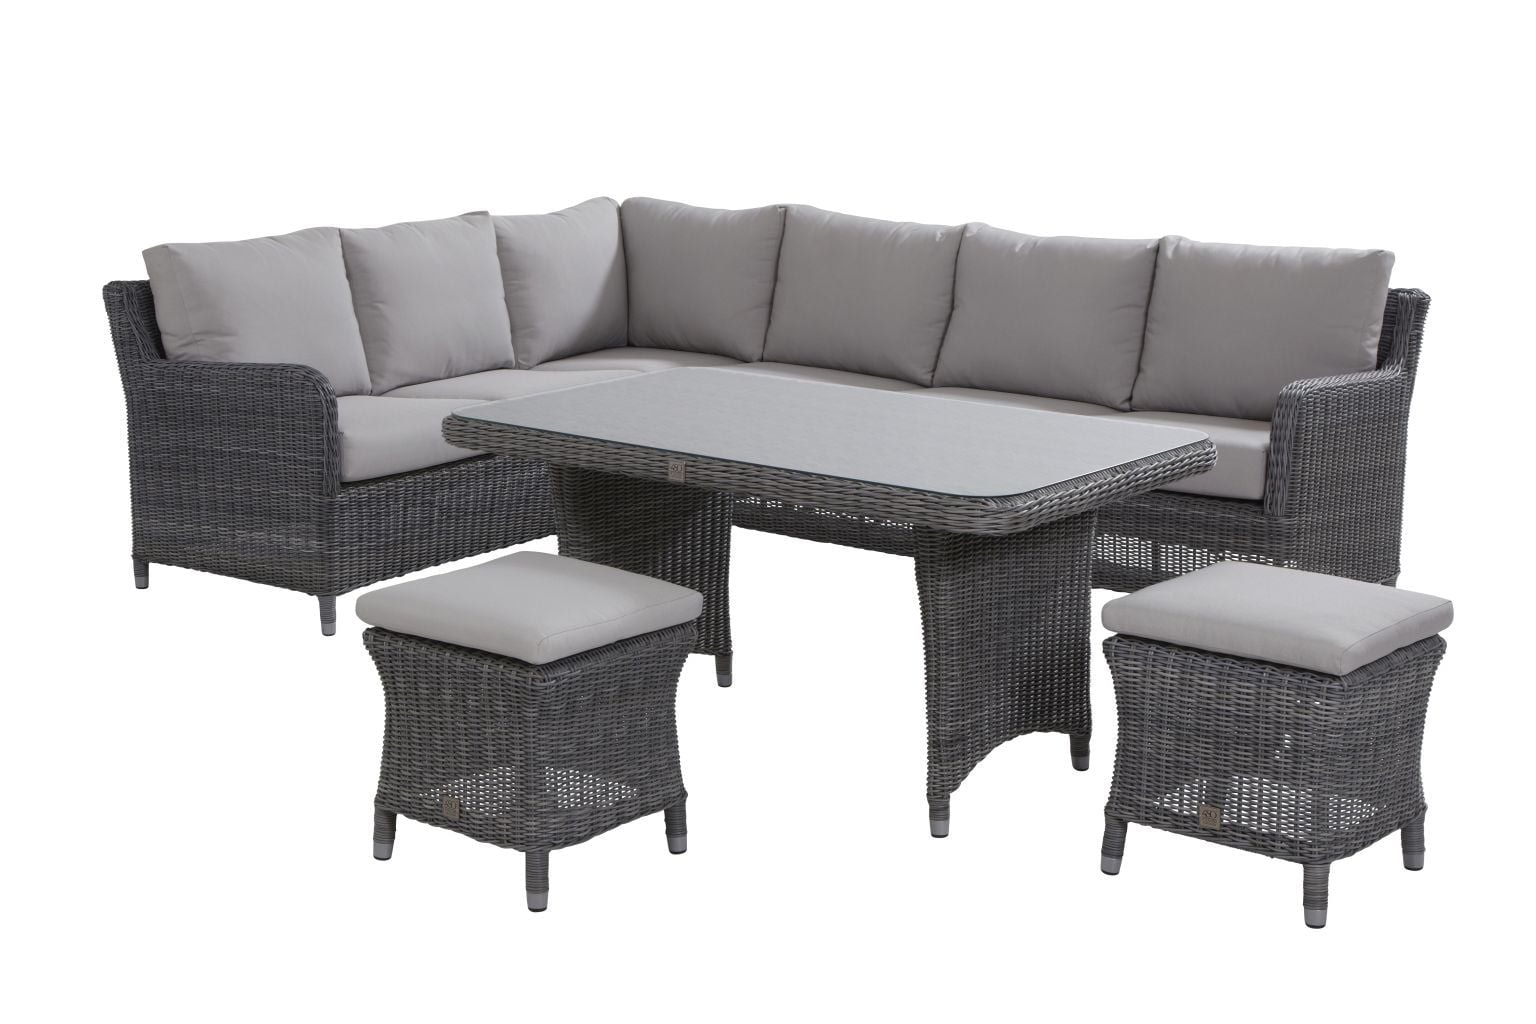 4 Seasons Outdoor Indigo Lounge -dining Rock